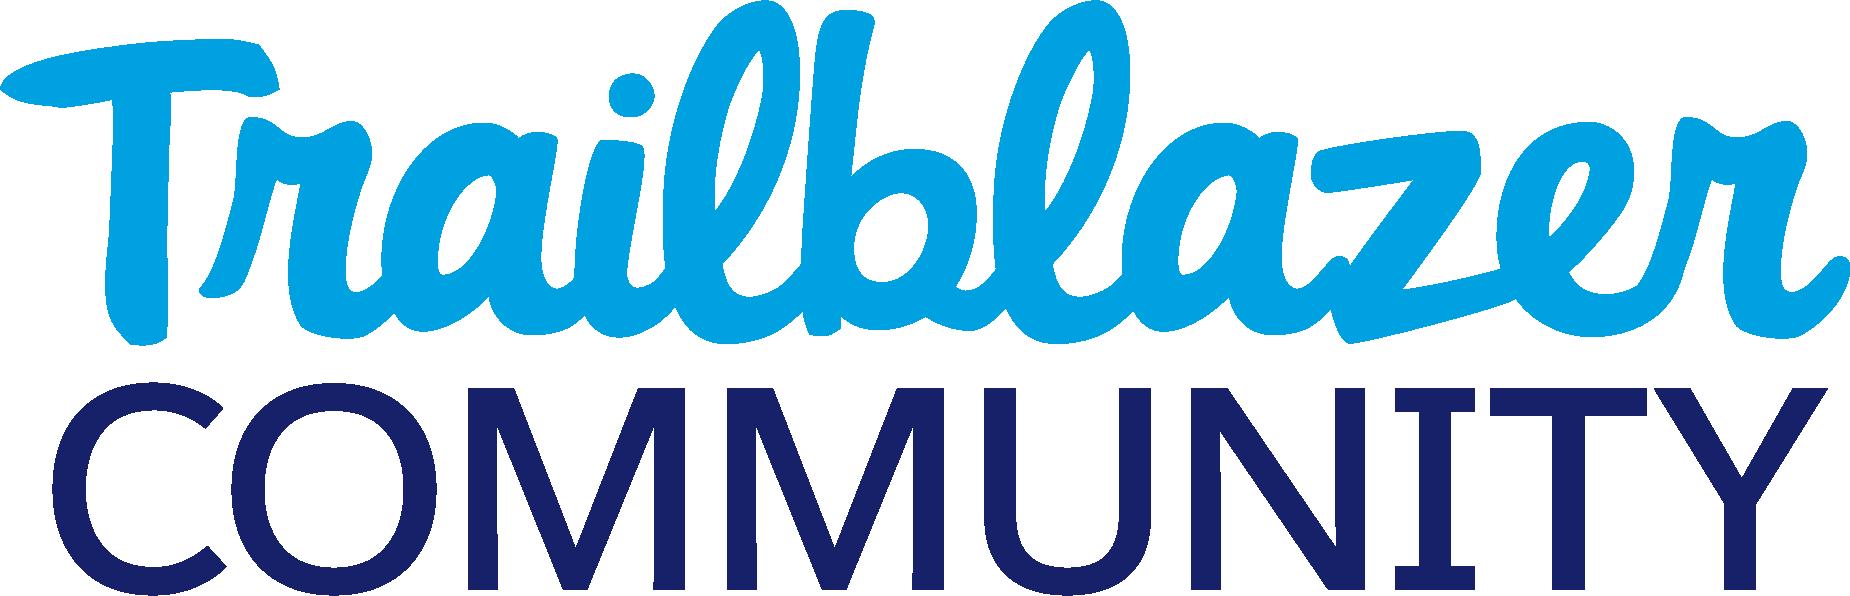 39e.trailblazer-community-logo.png